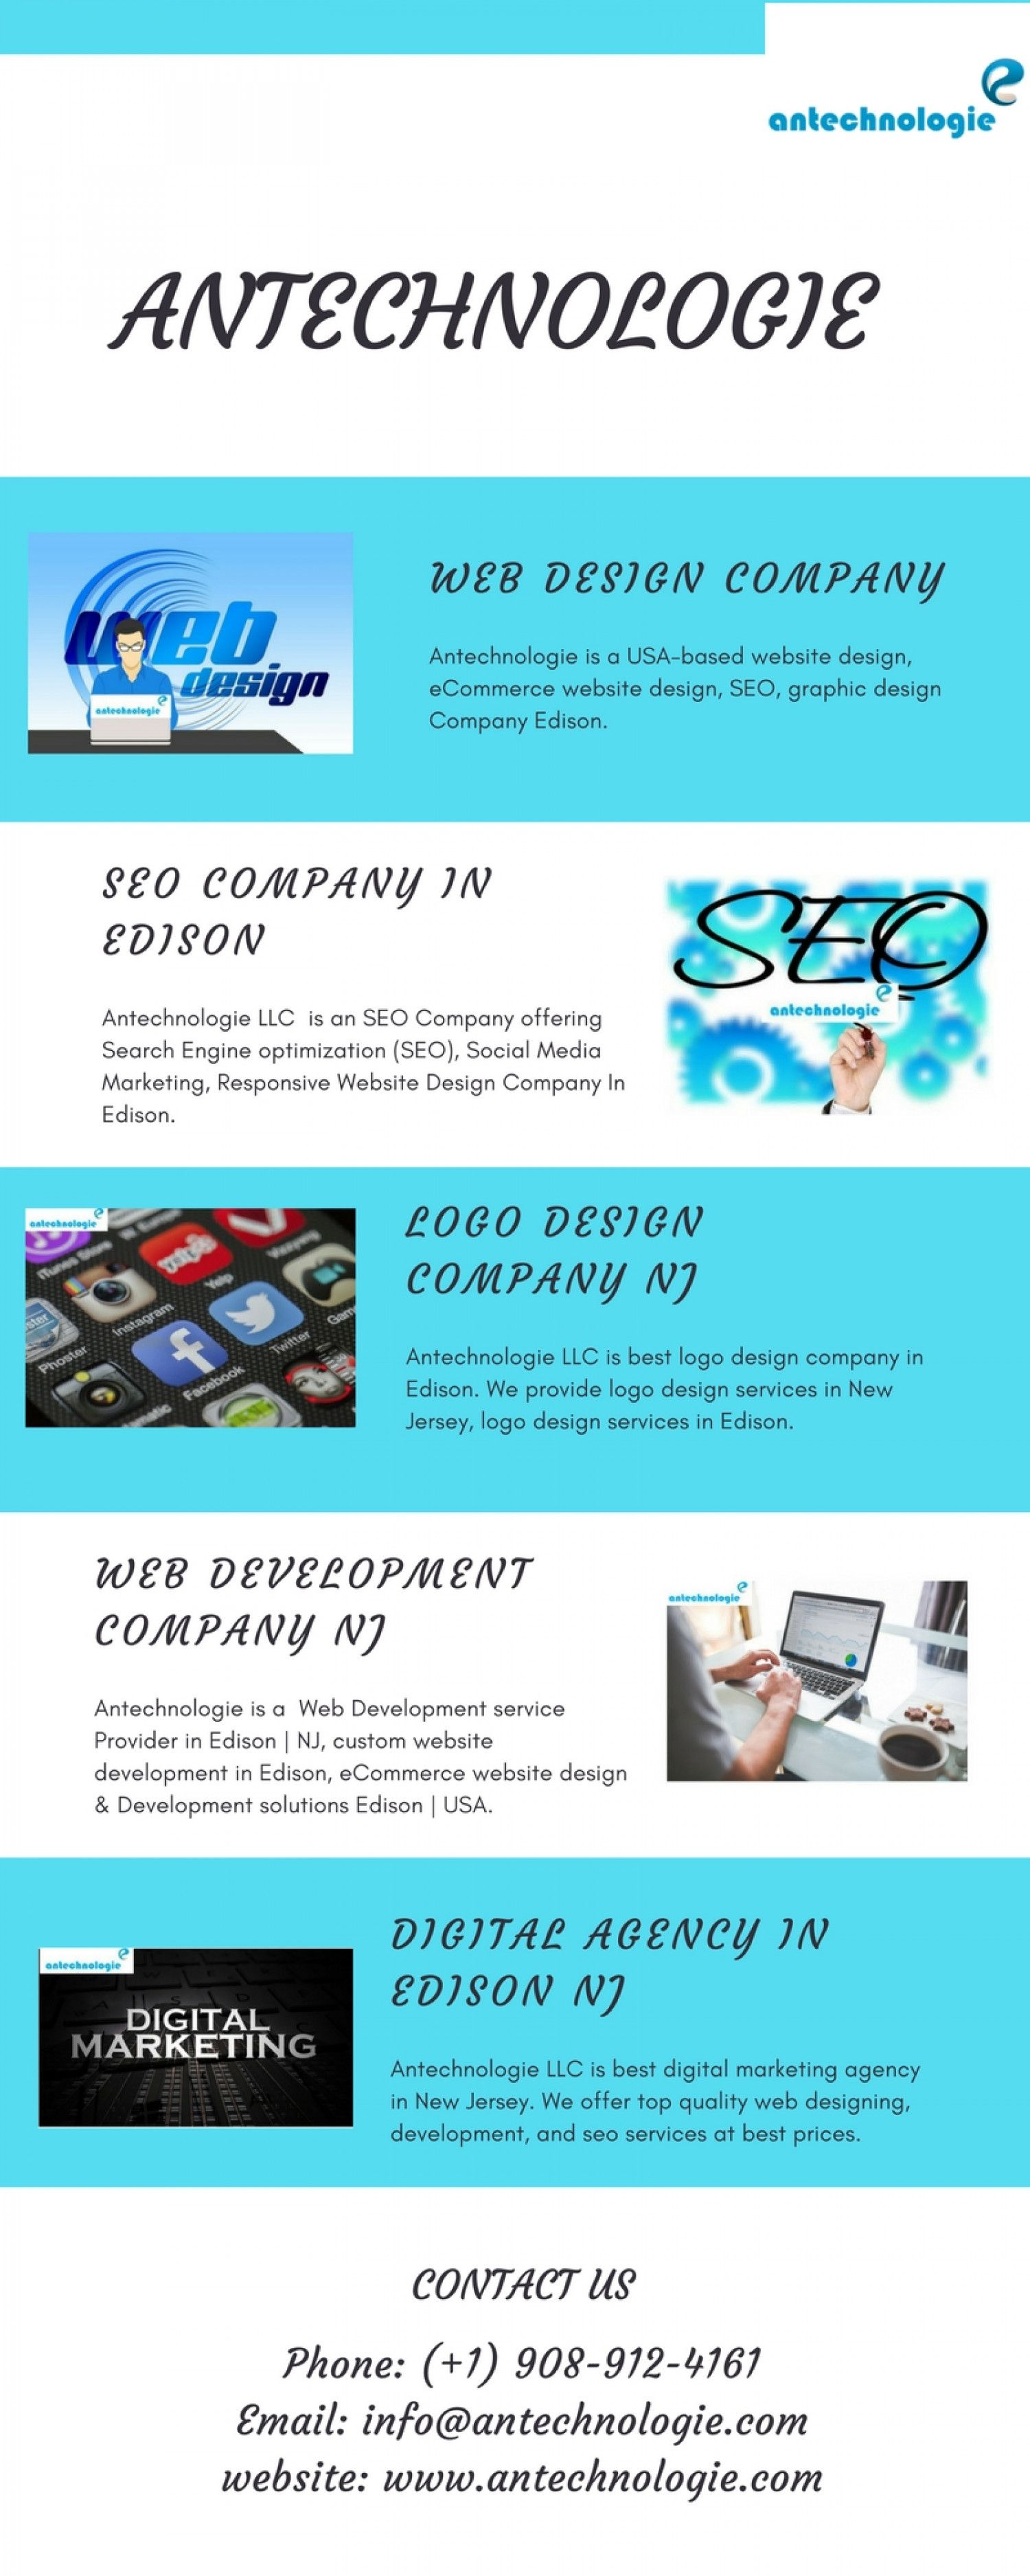 Web Designers Antechnologie Nj Web Design Web Development Company Web Design Website Design Company Web Development Company